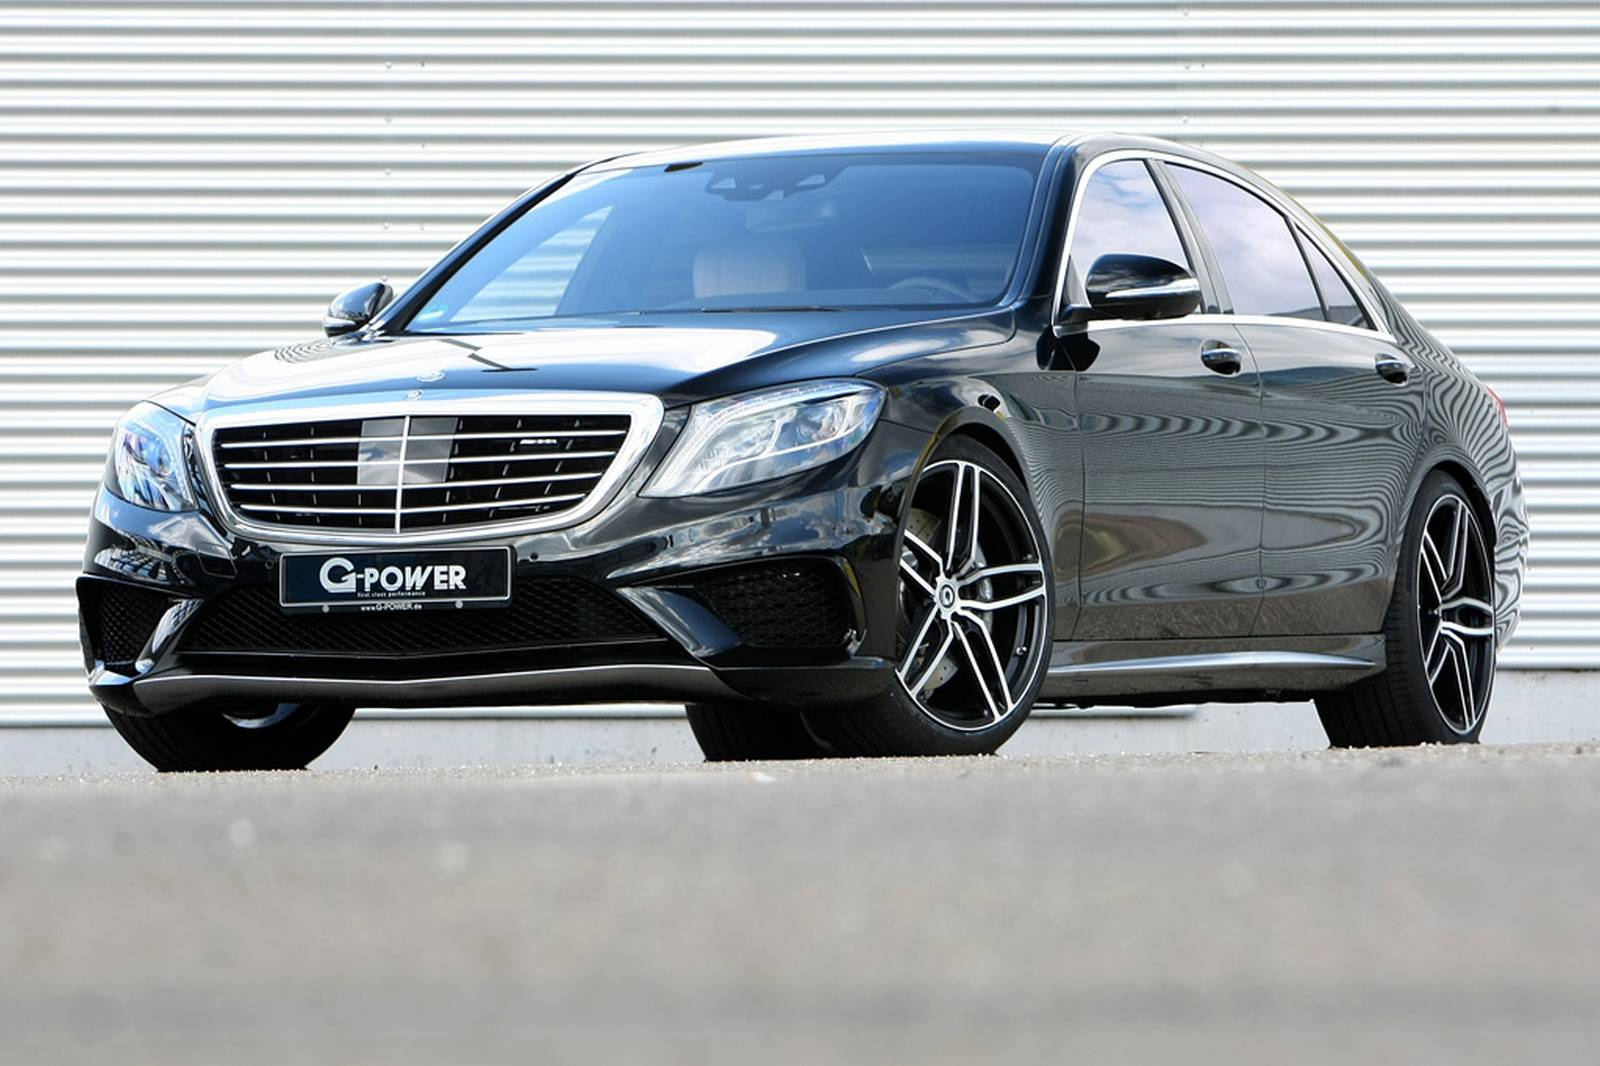 Official g power mercedes benz s63 amg gtspirit for Mercedes benz amg s63